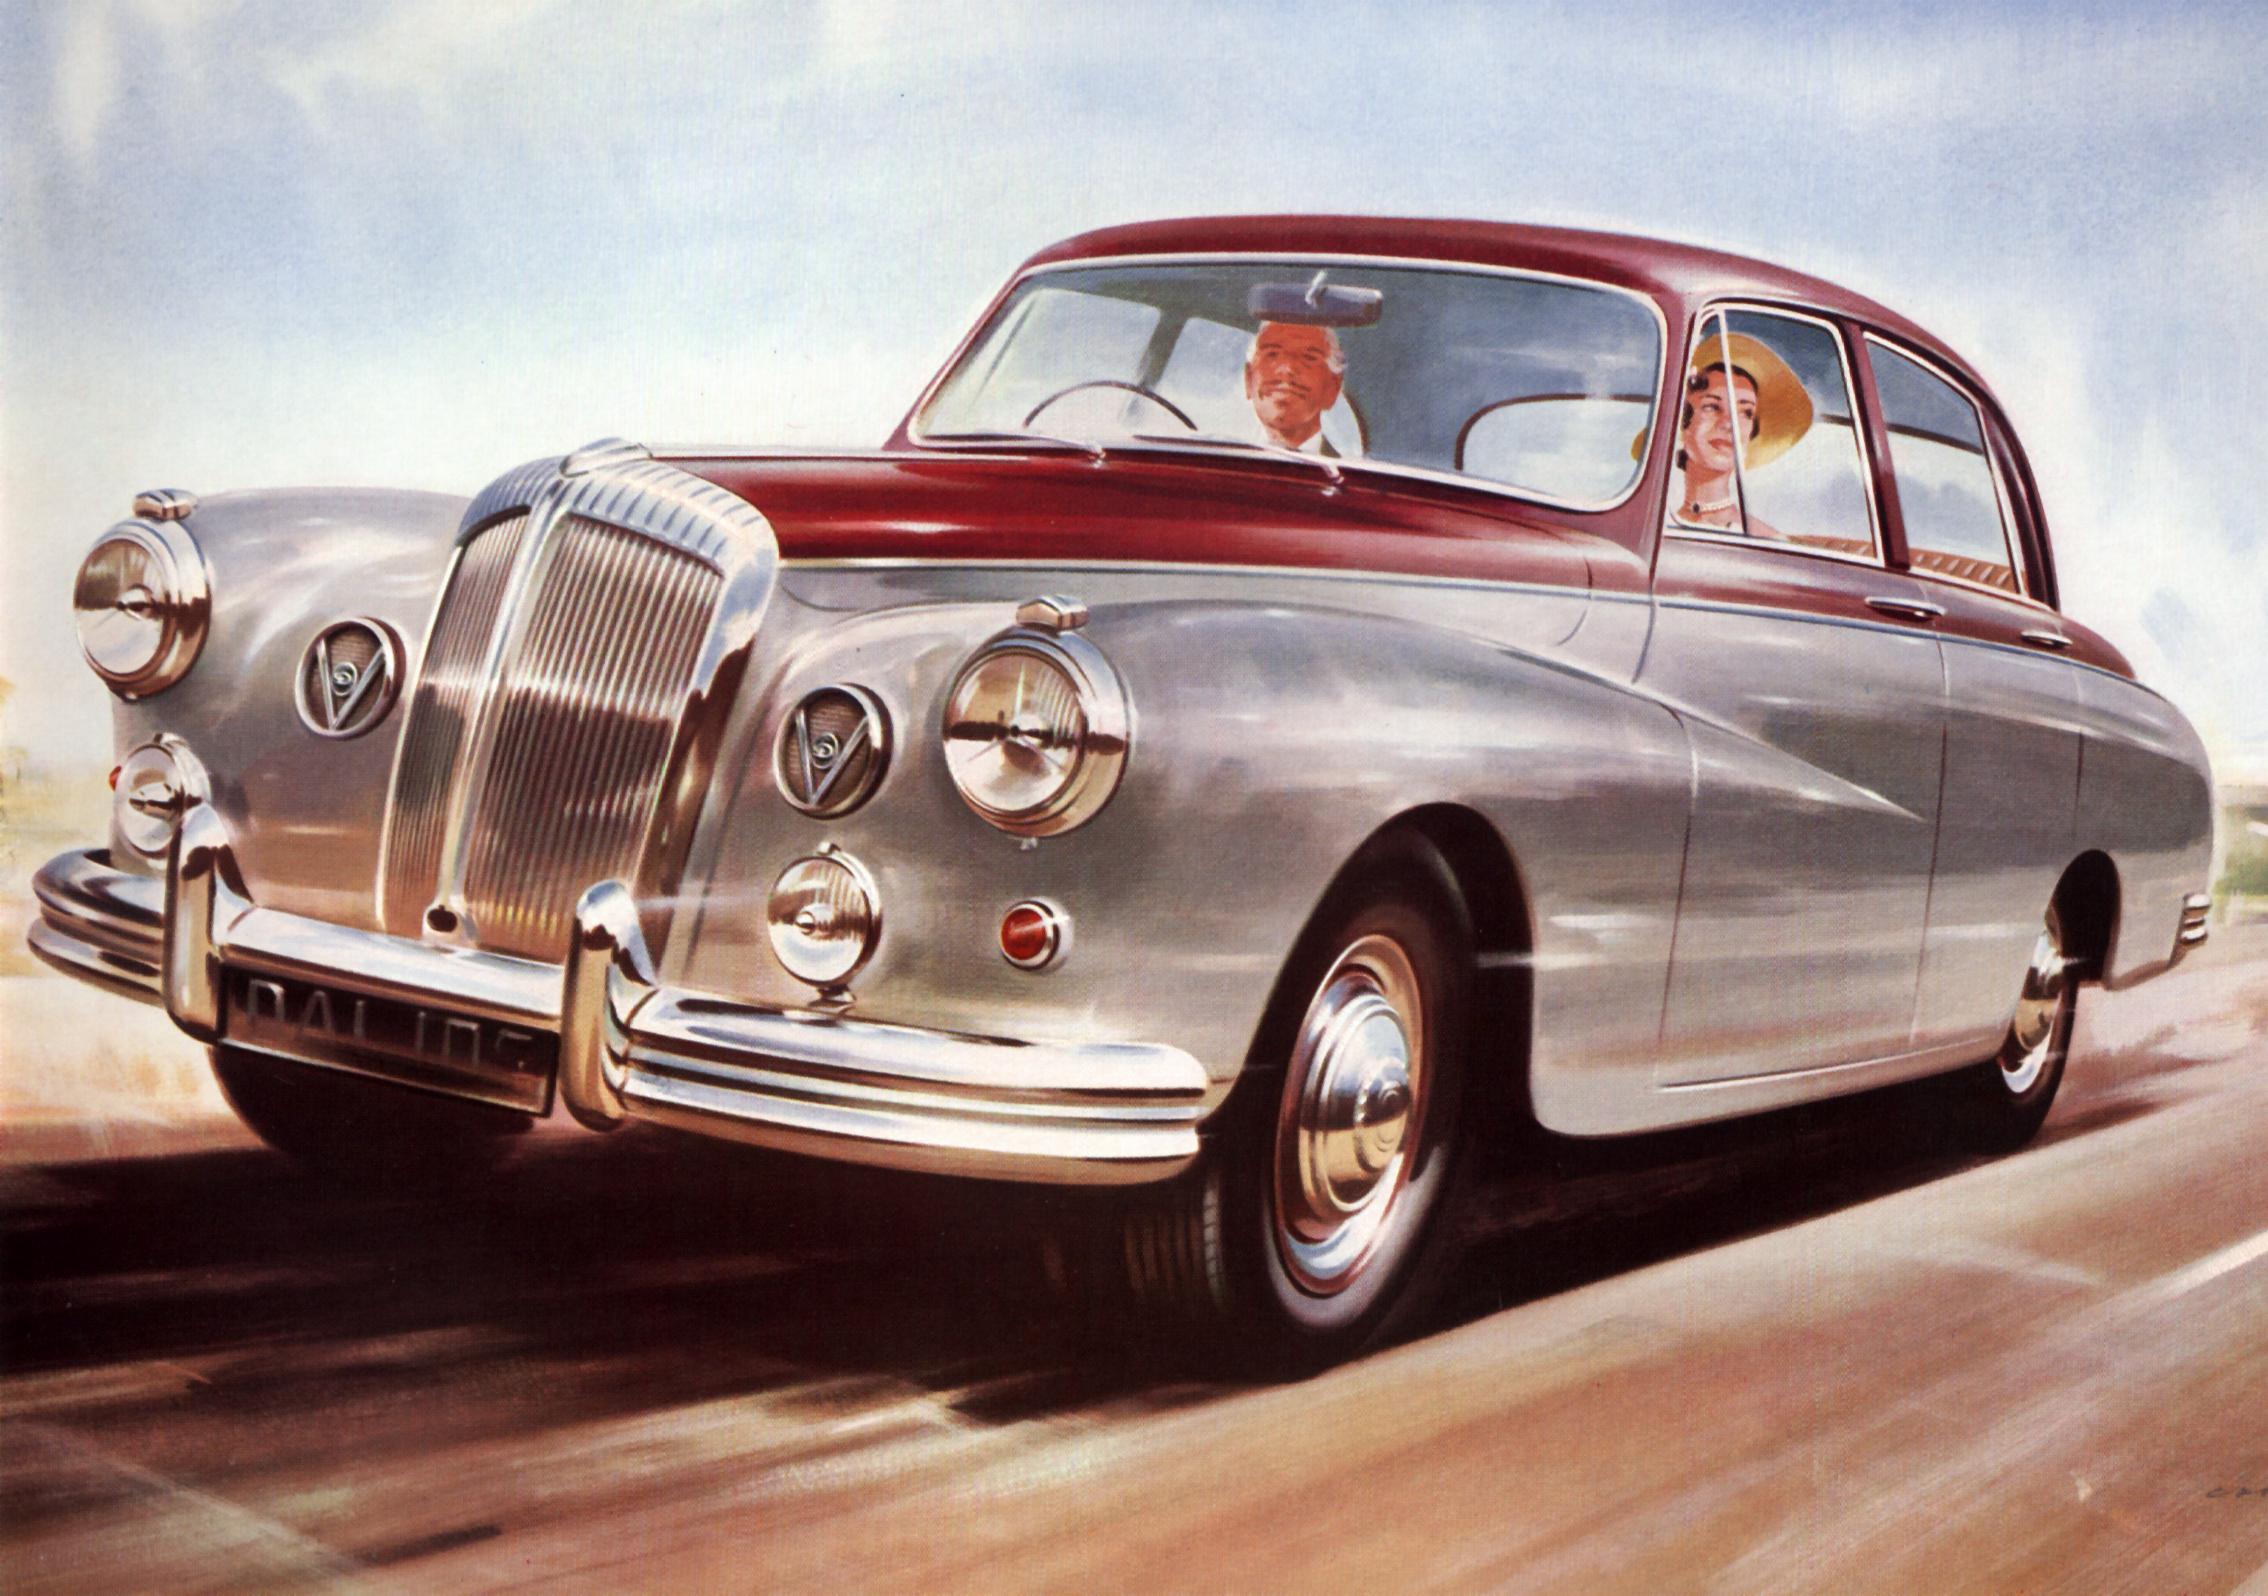 Daimler Majestic Major 001